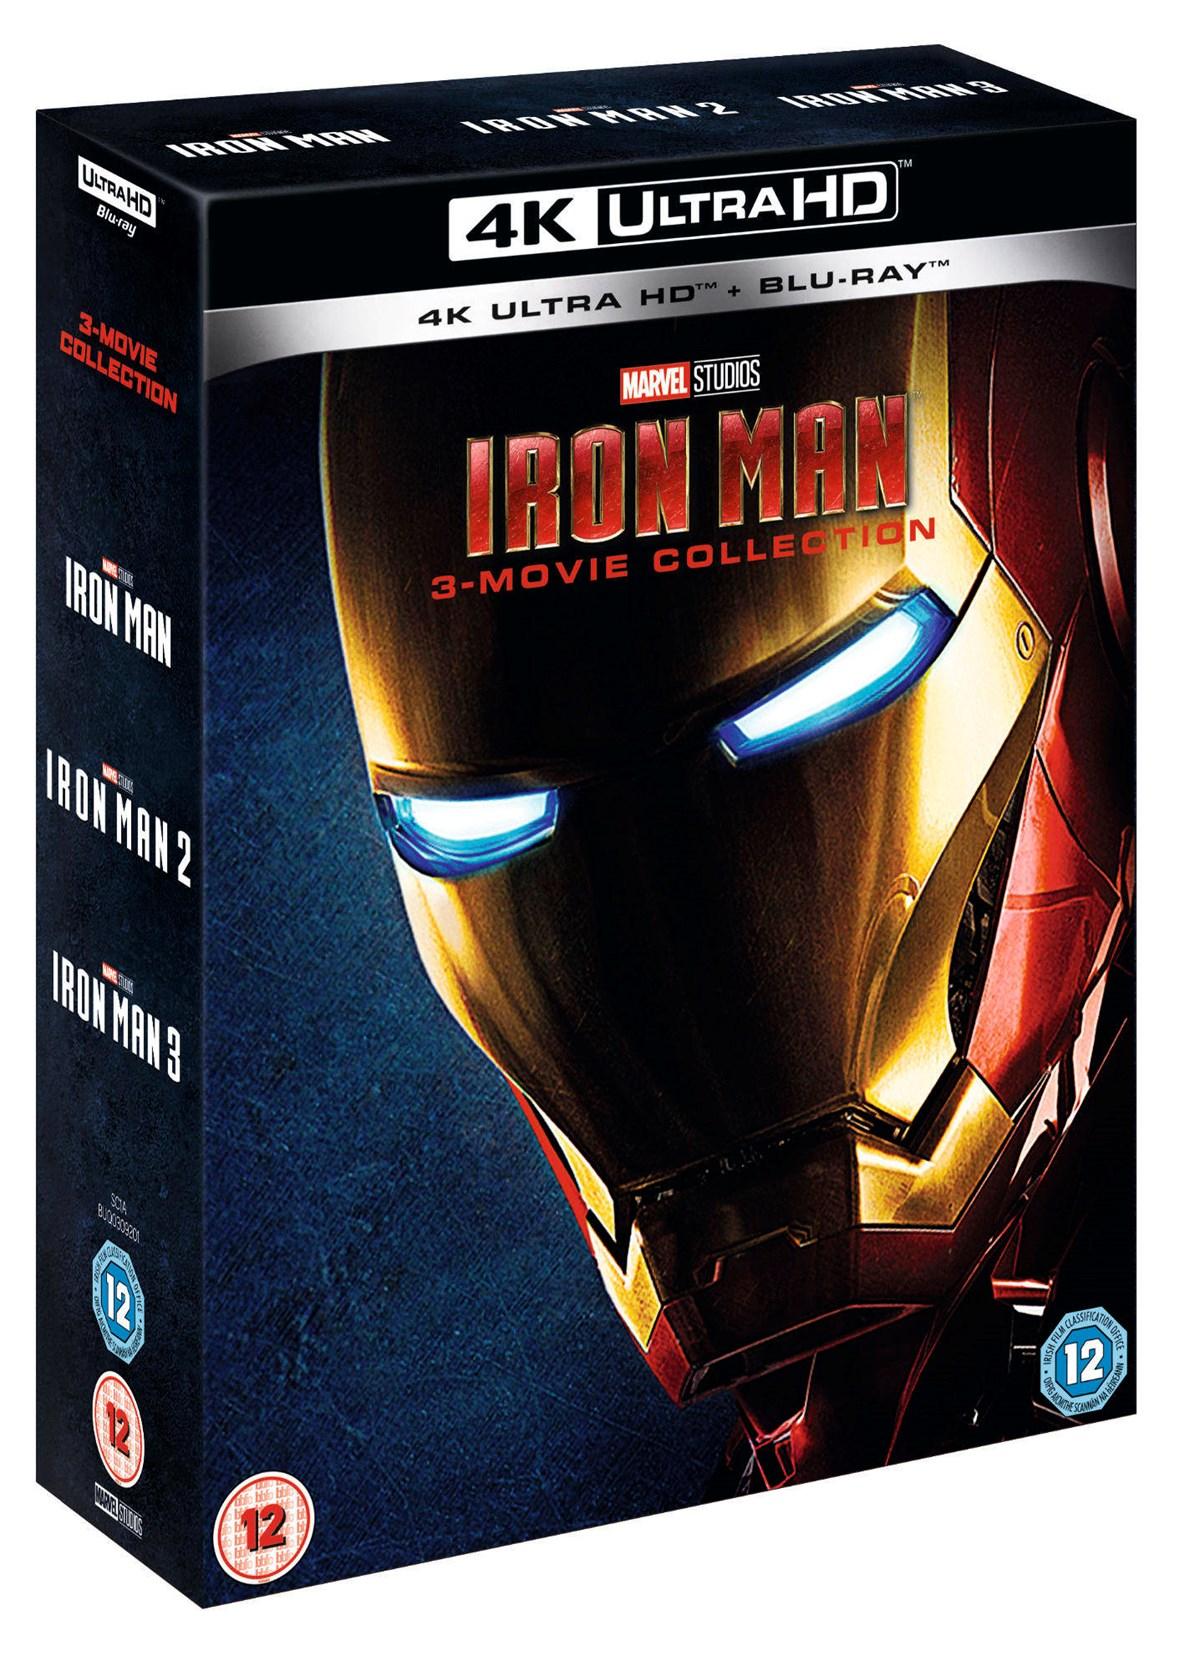 Iron Man 3-Movie Collection (4K Ultra HD + Blu-ray (Boxset)) [UHD] £35.99 Zoom